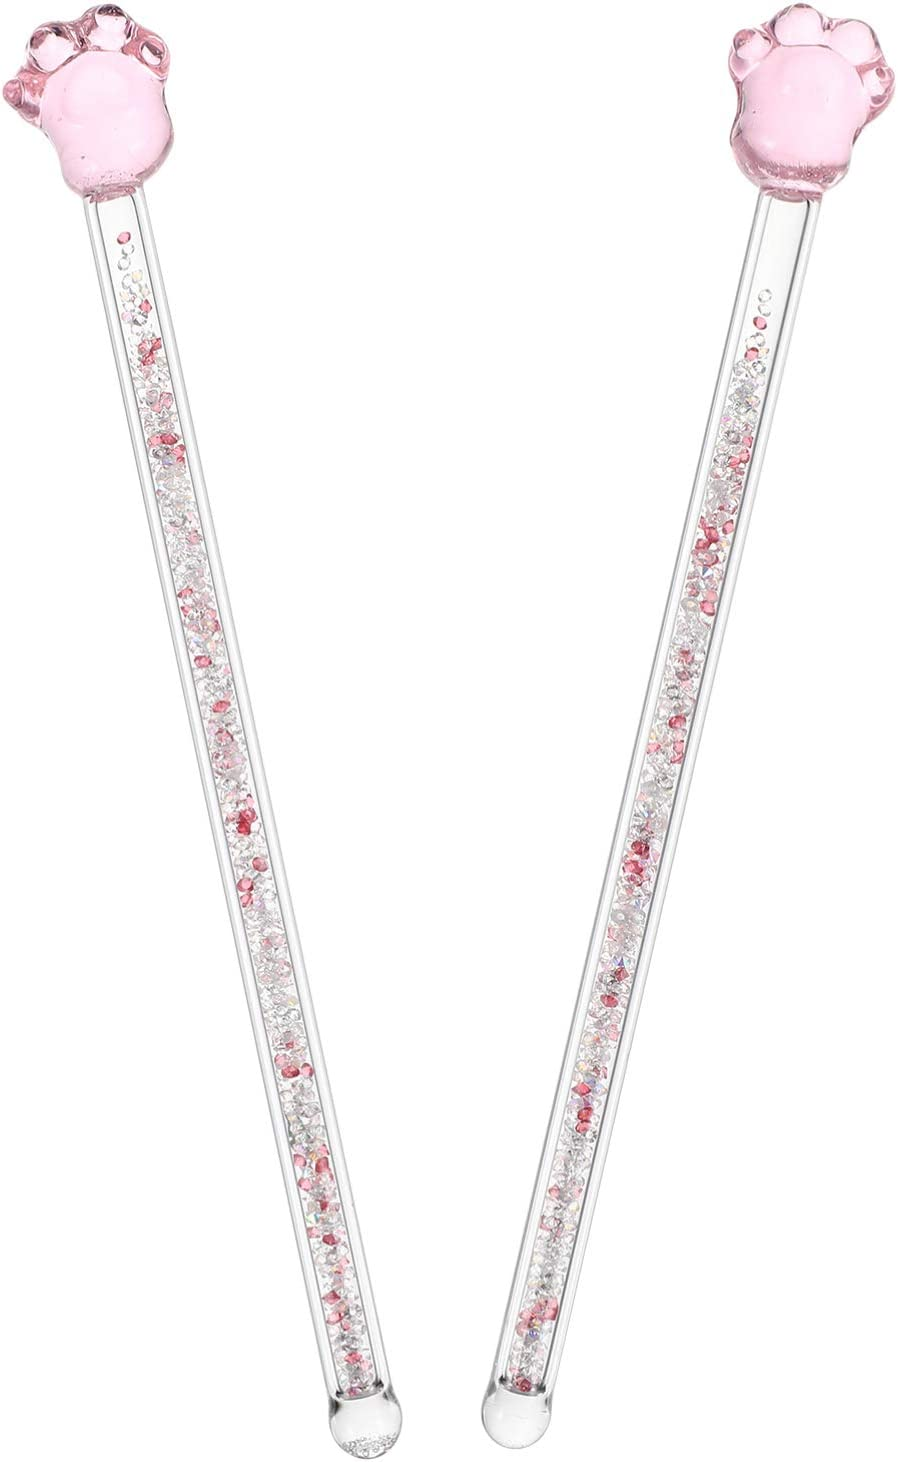 Hemoton 2pcs favorite Glass Drink Stirs Sticks Long Handle Stirri Swizzle New product!!